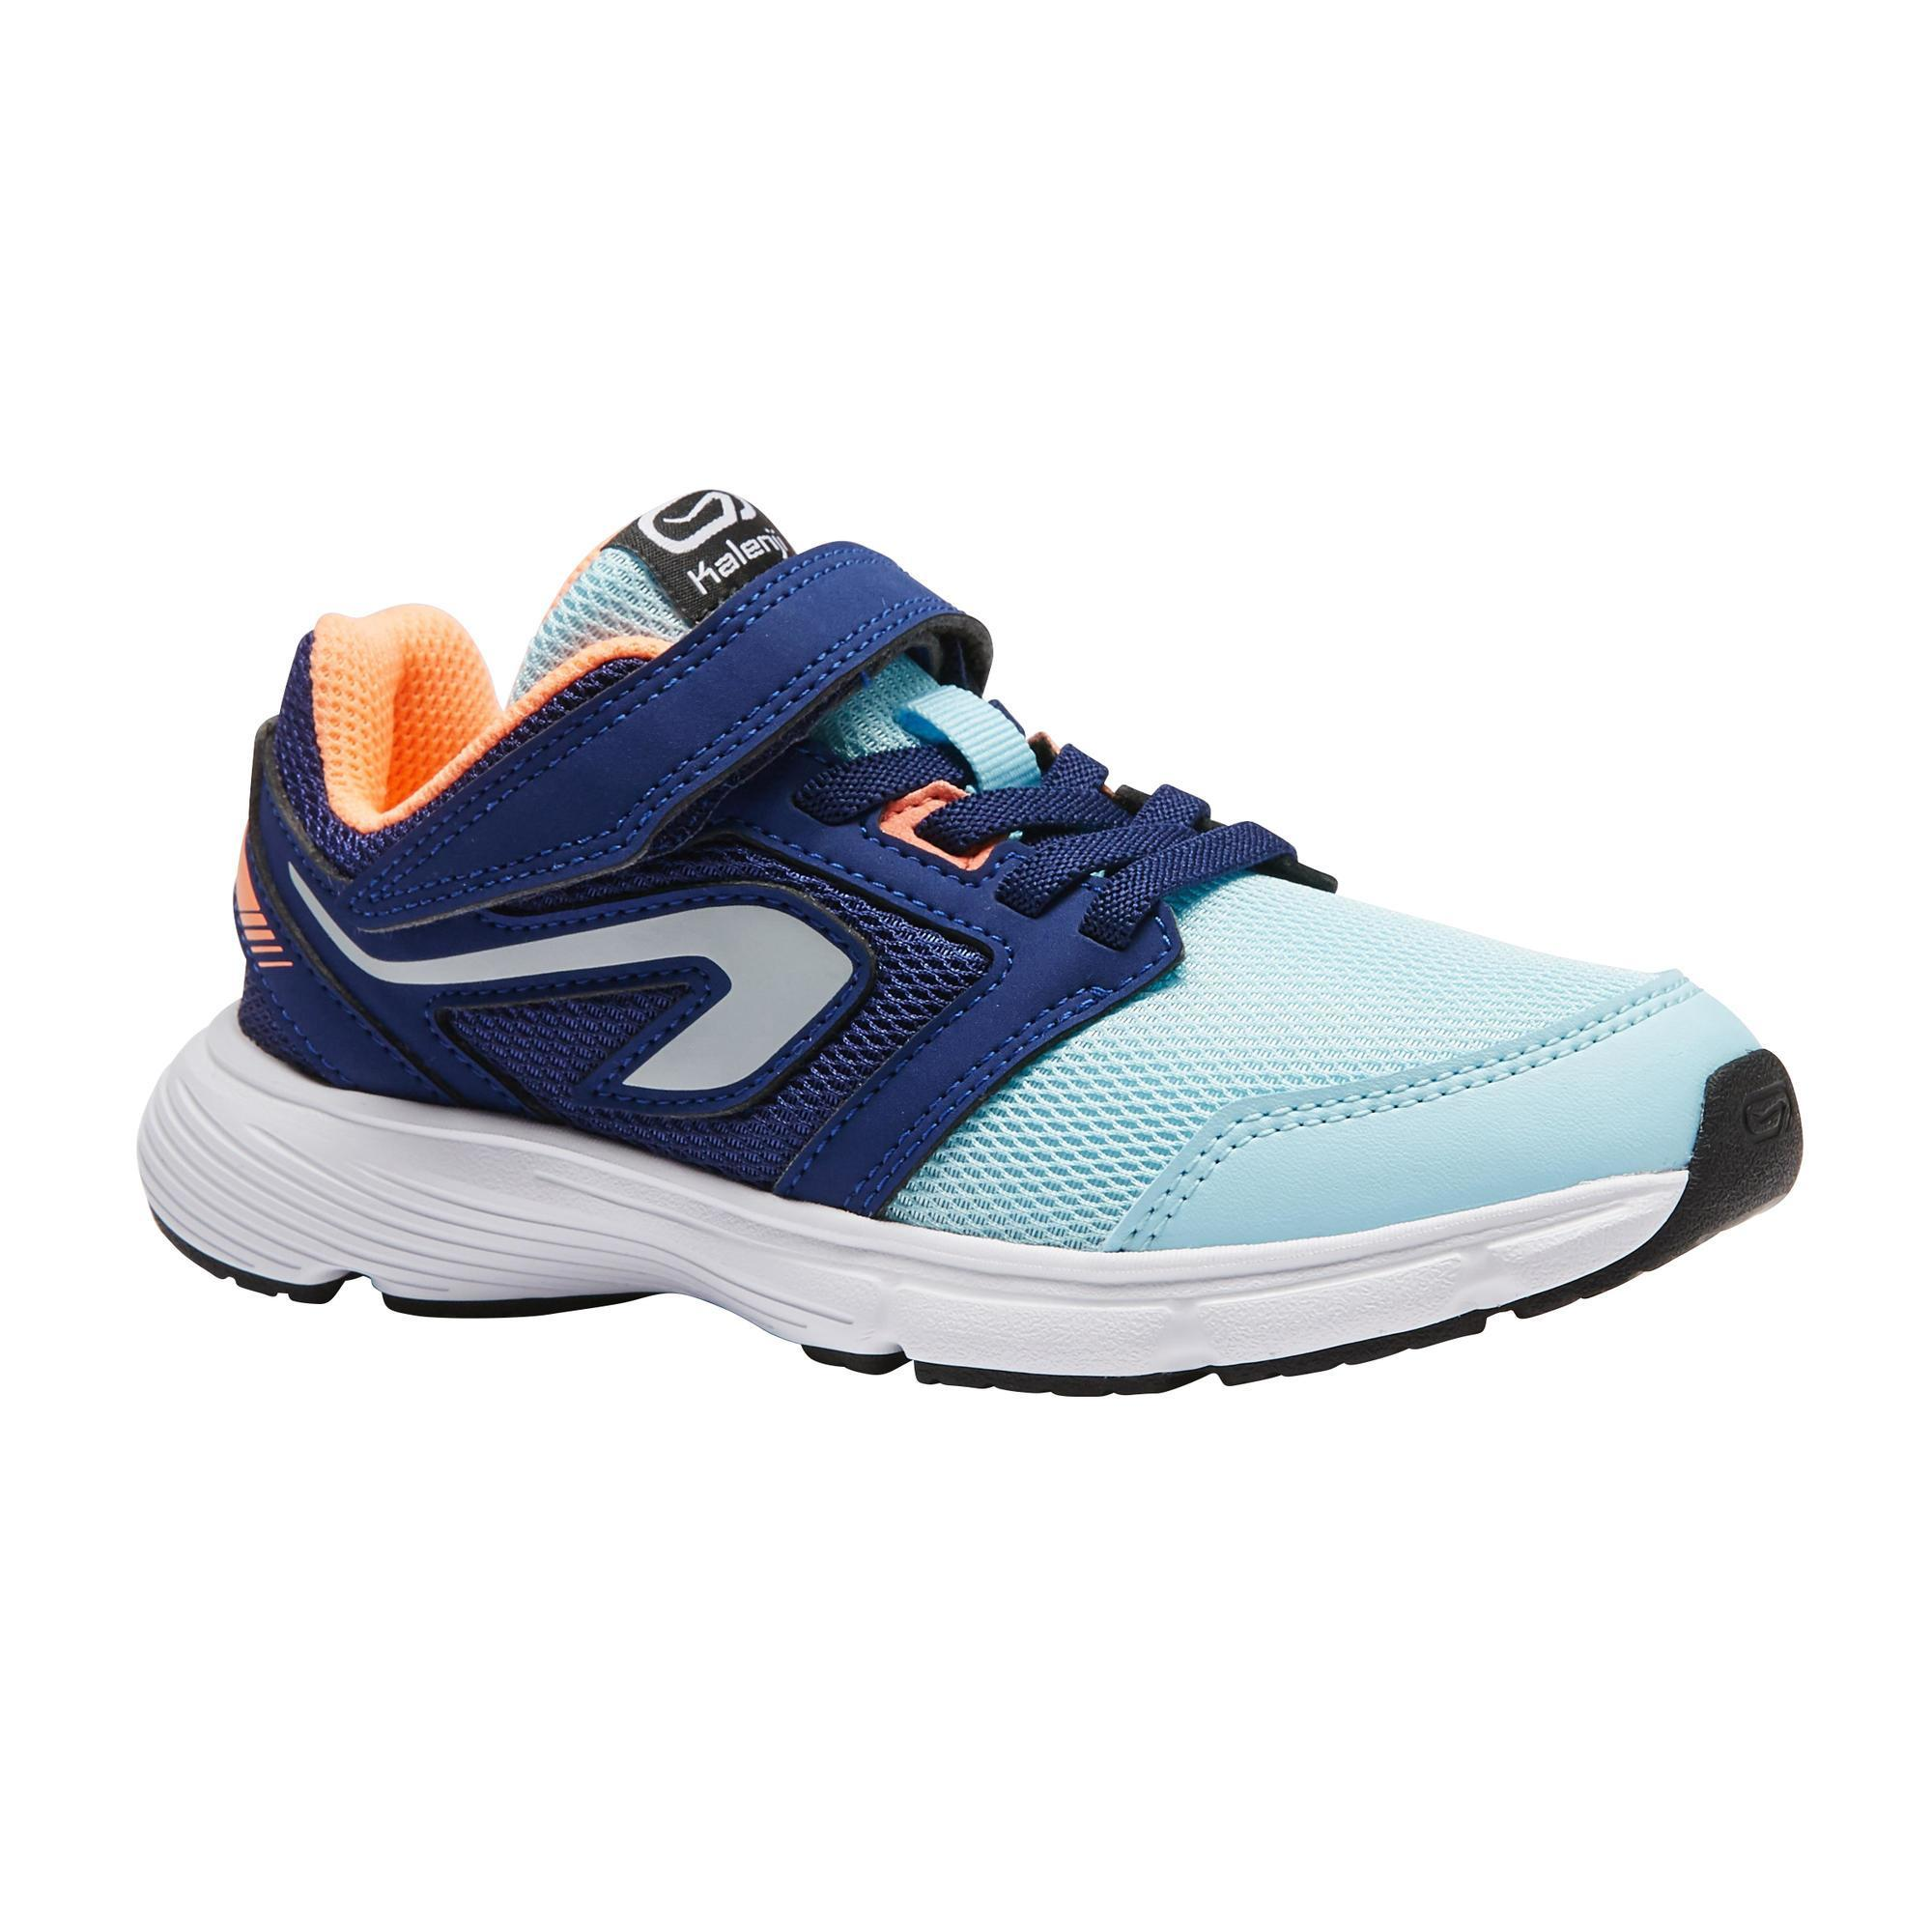 Kalenji Hardloopschoenen kinderen Run Support klittenband blauw/koraalrood